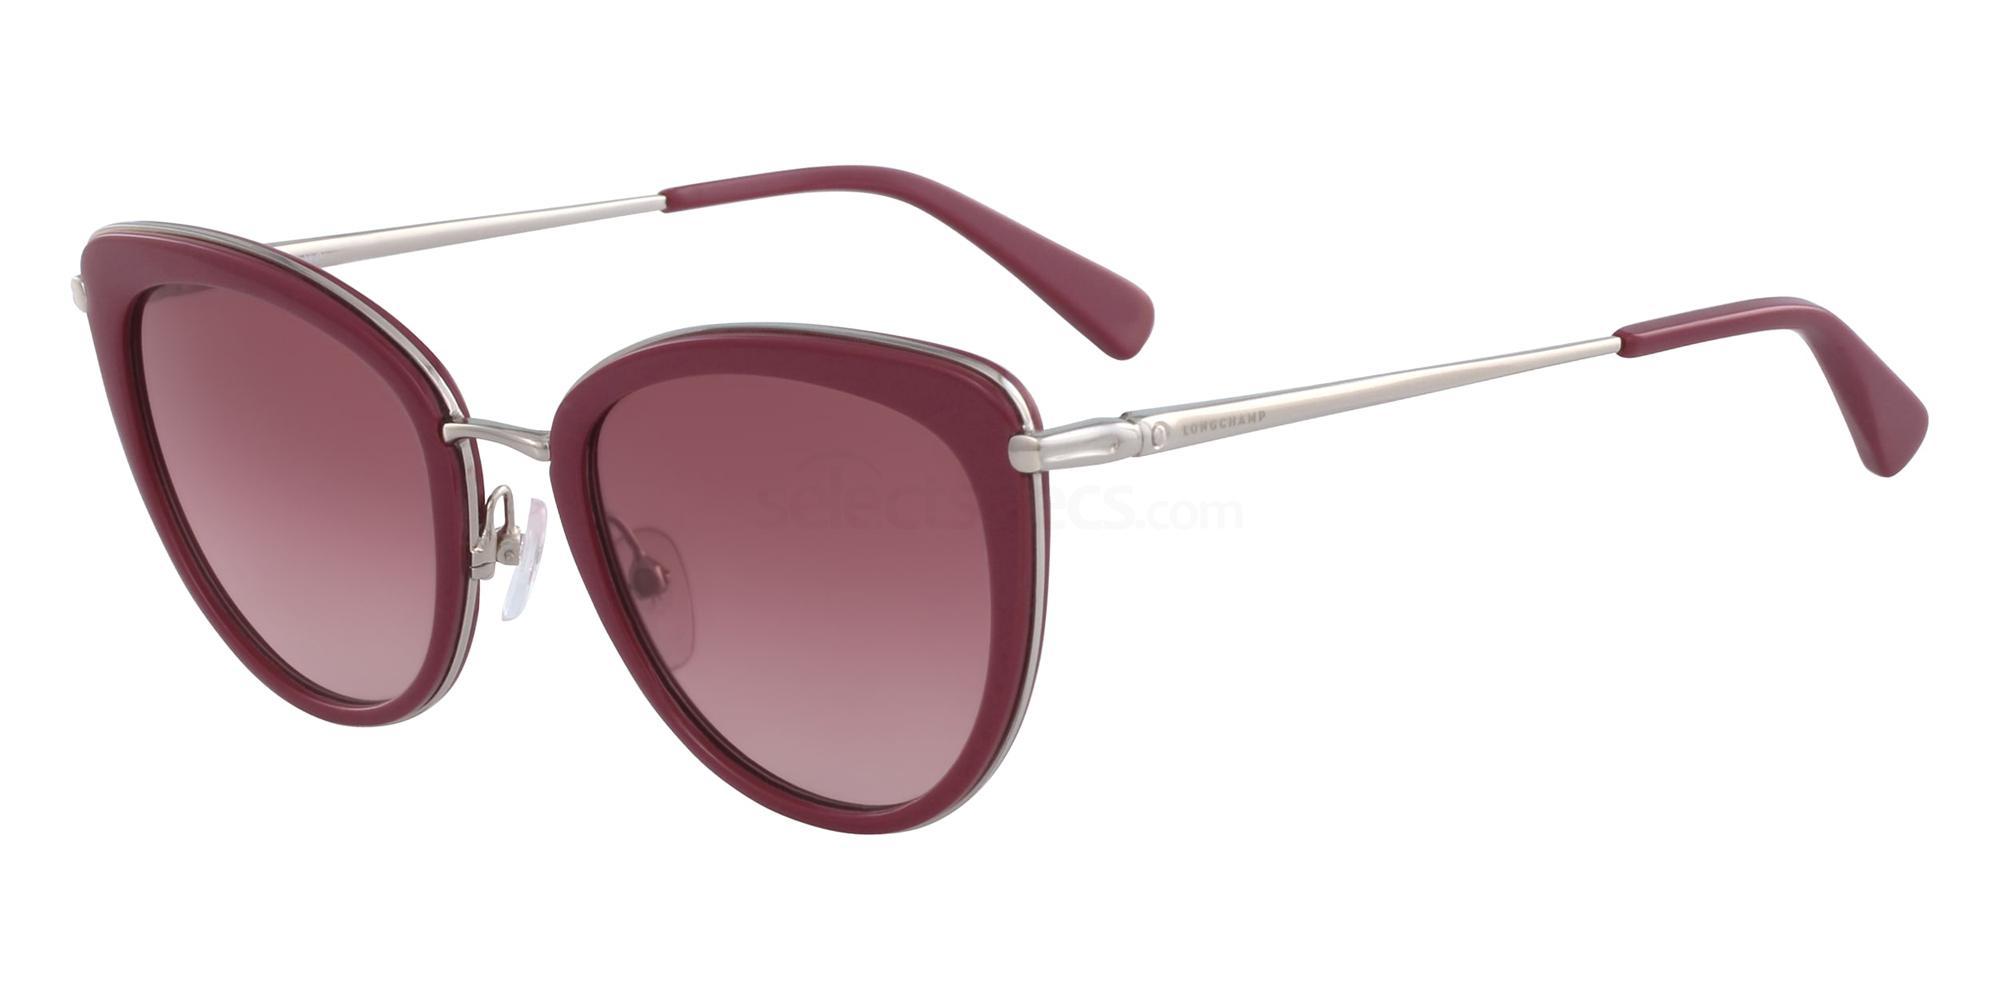 622 LO633S Sunglasses, LONGCHAMP